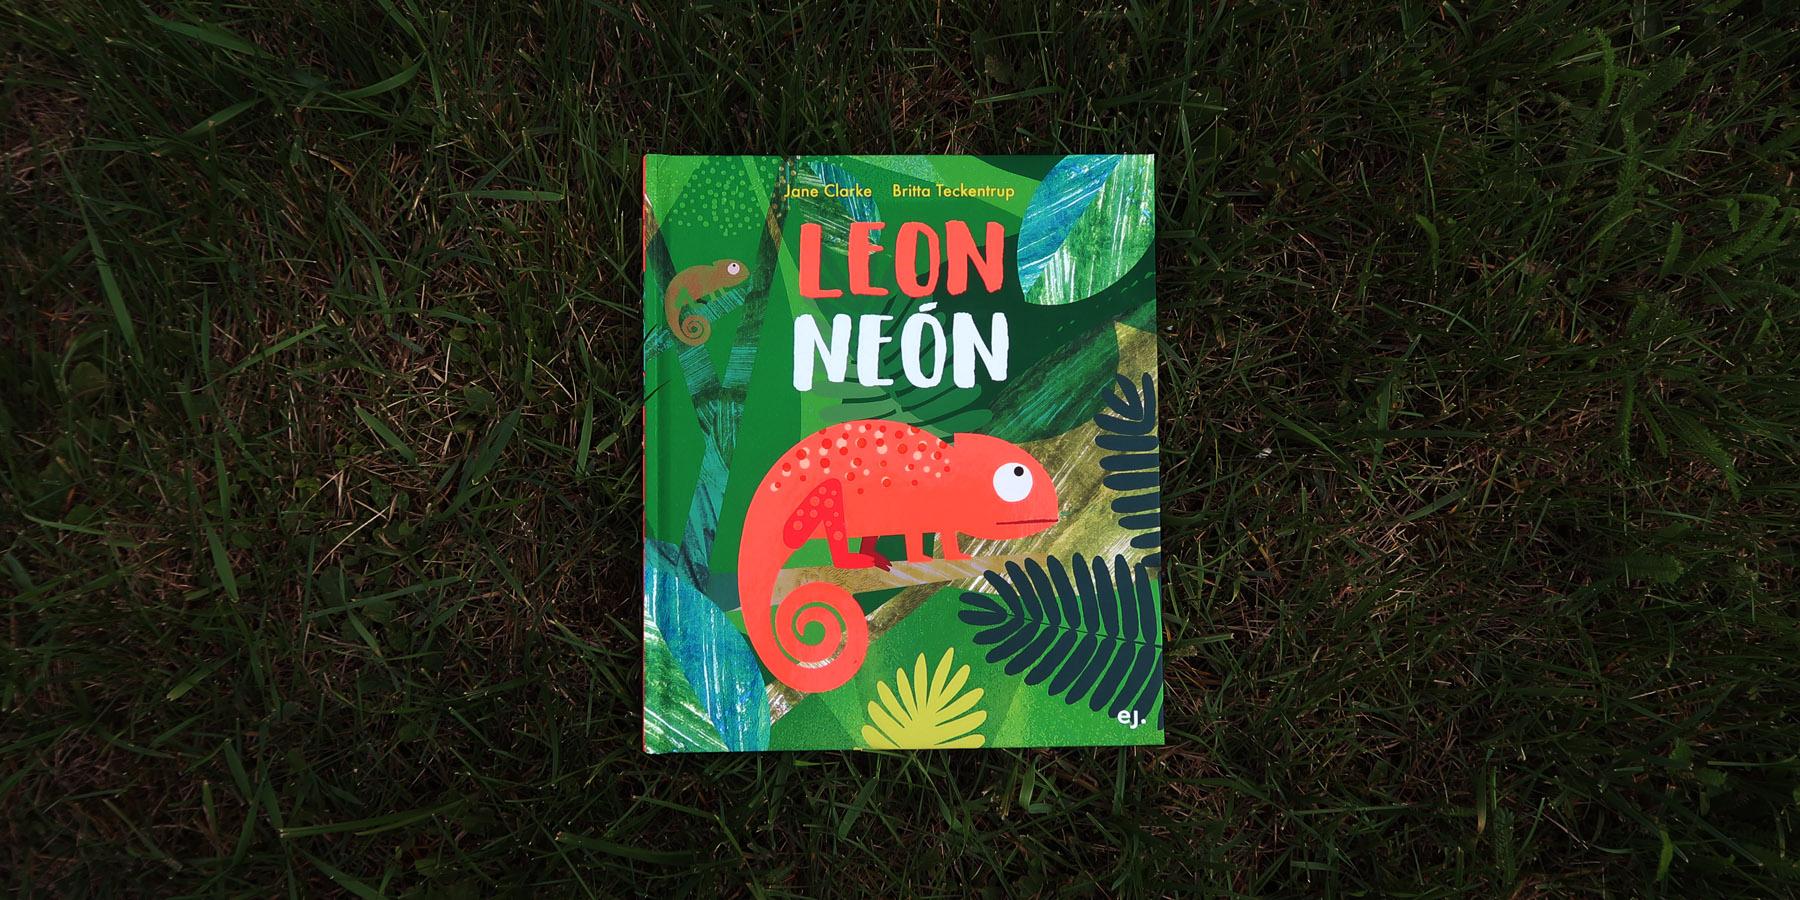 Leon Neón